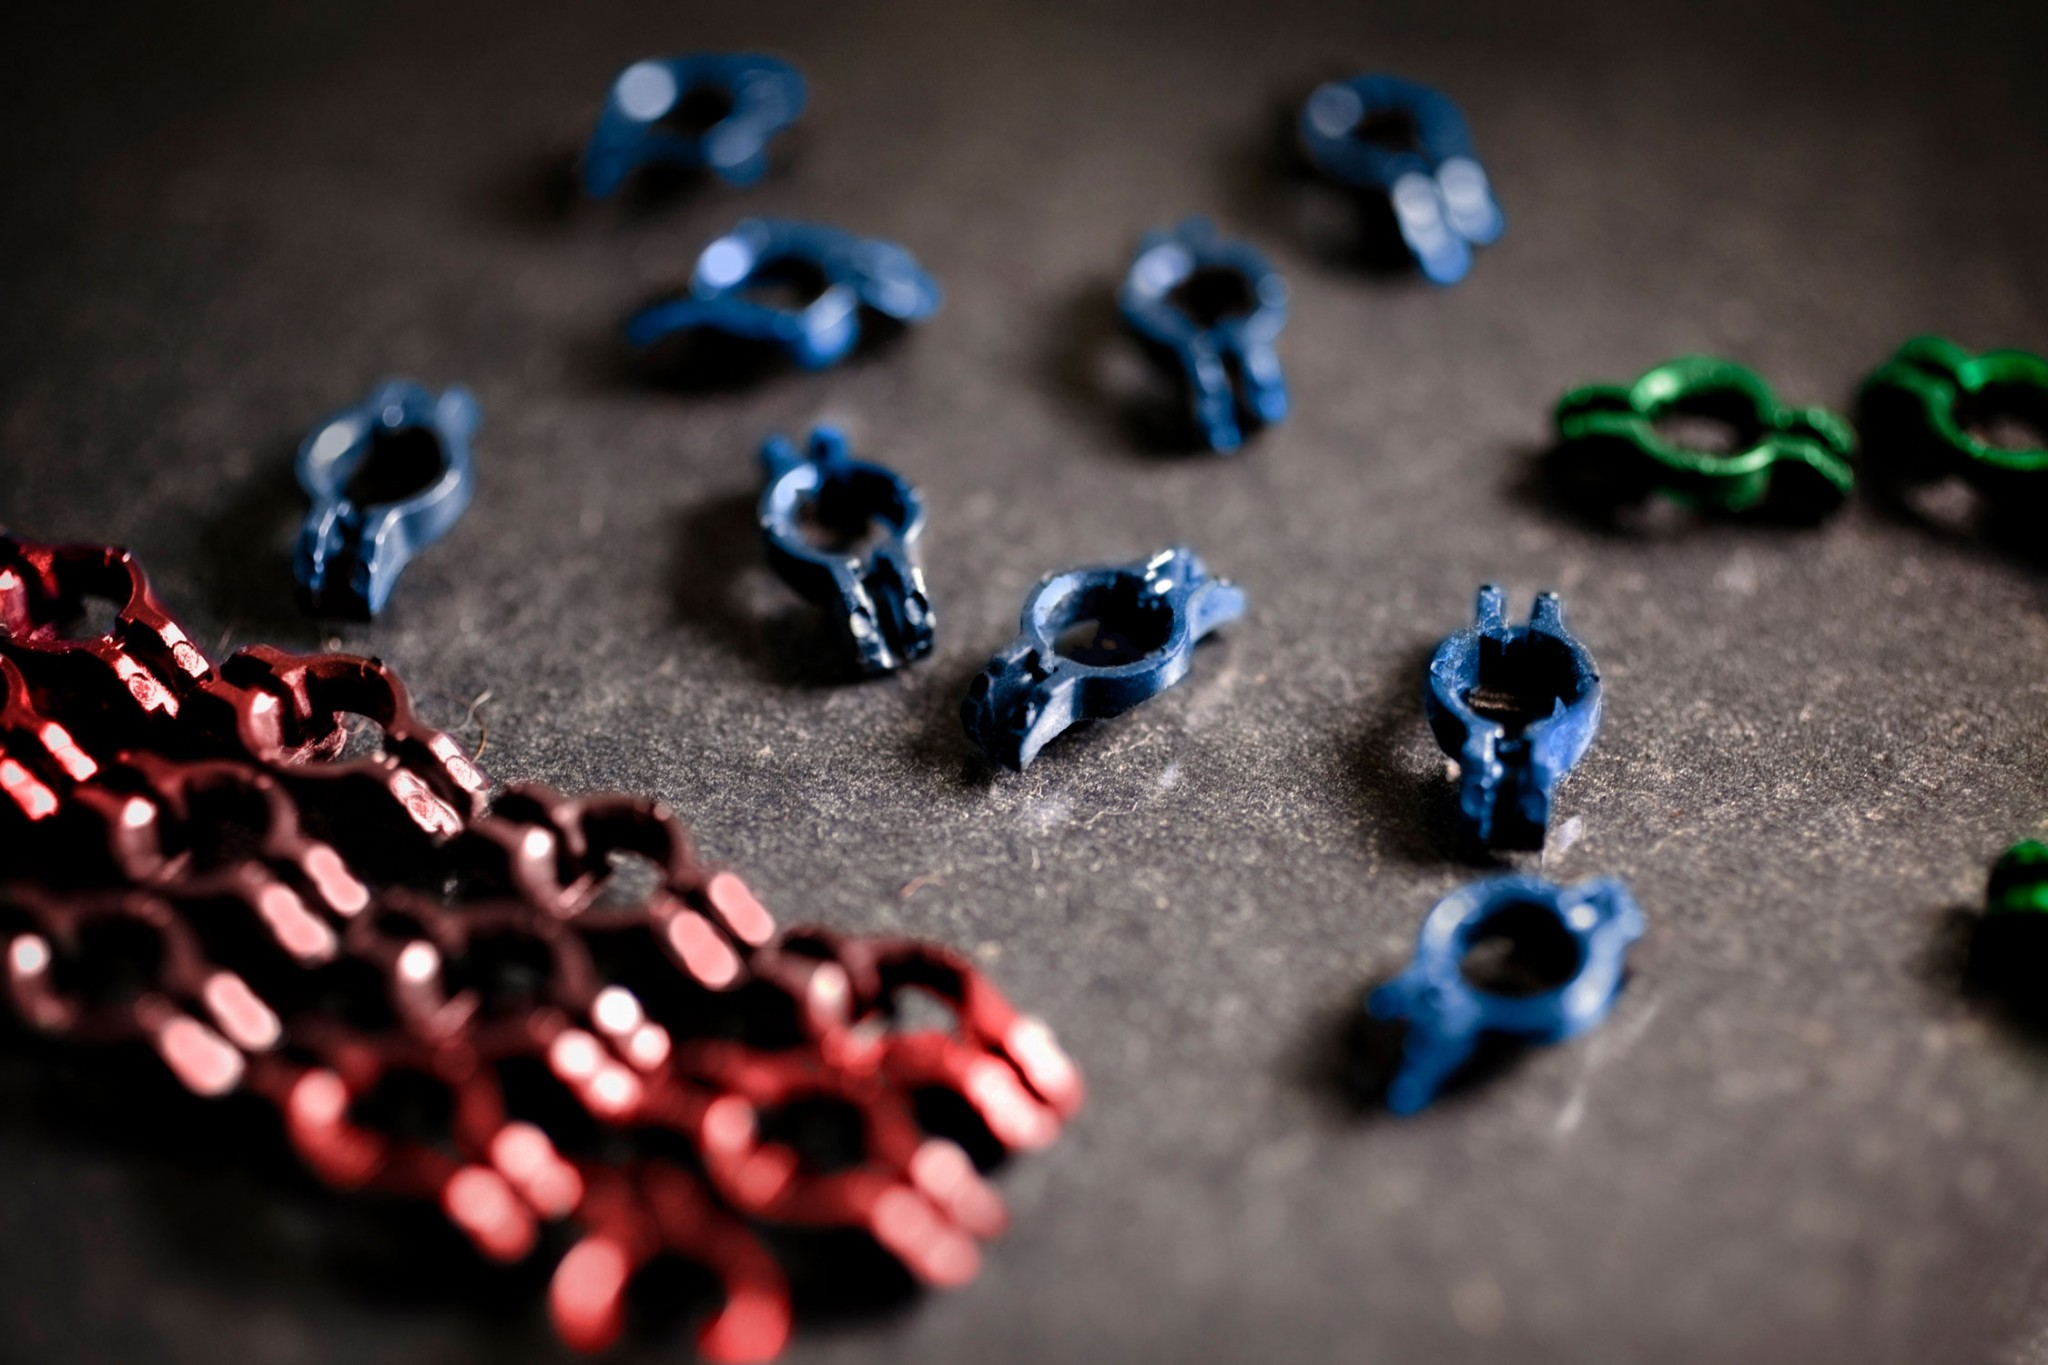 Colored plastic parts